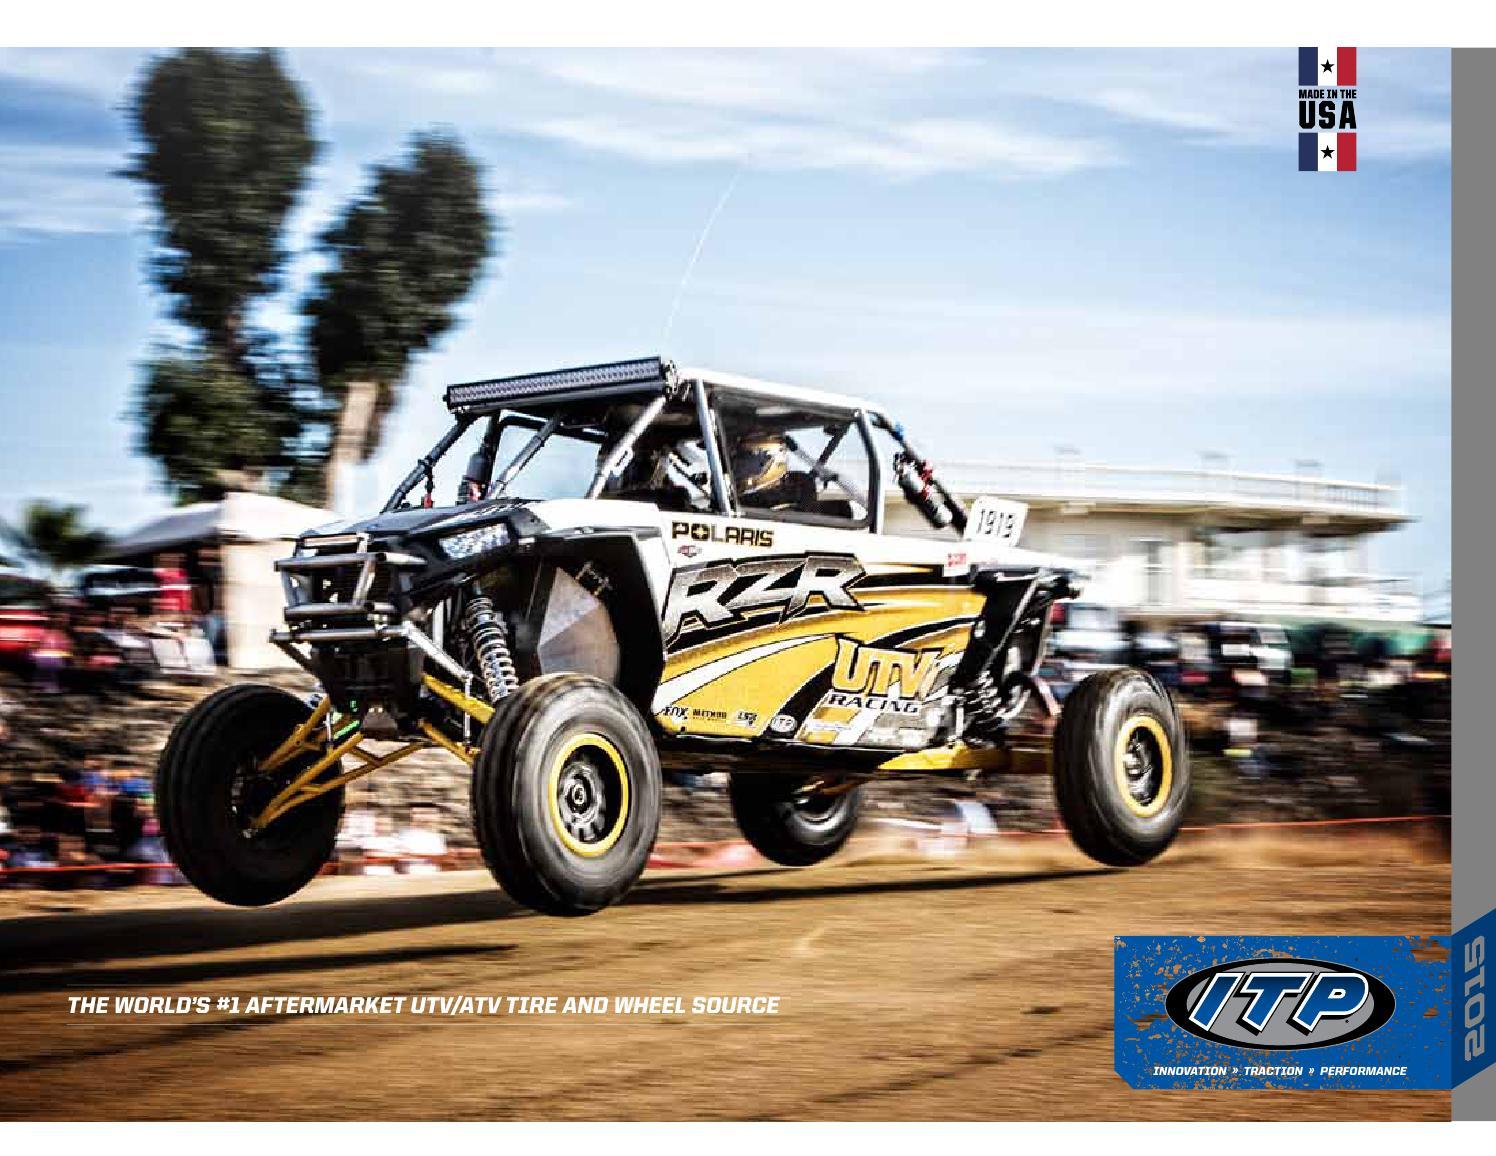 4 Full set of ITP Mud Lite XL 27x9-12 and 27x10-12 ATV Tires